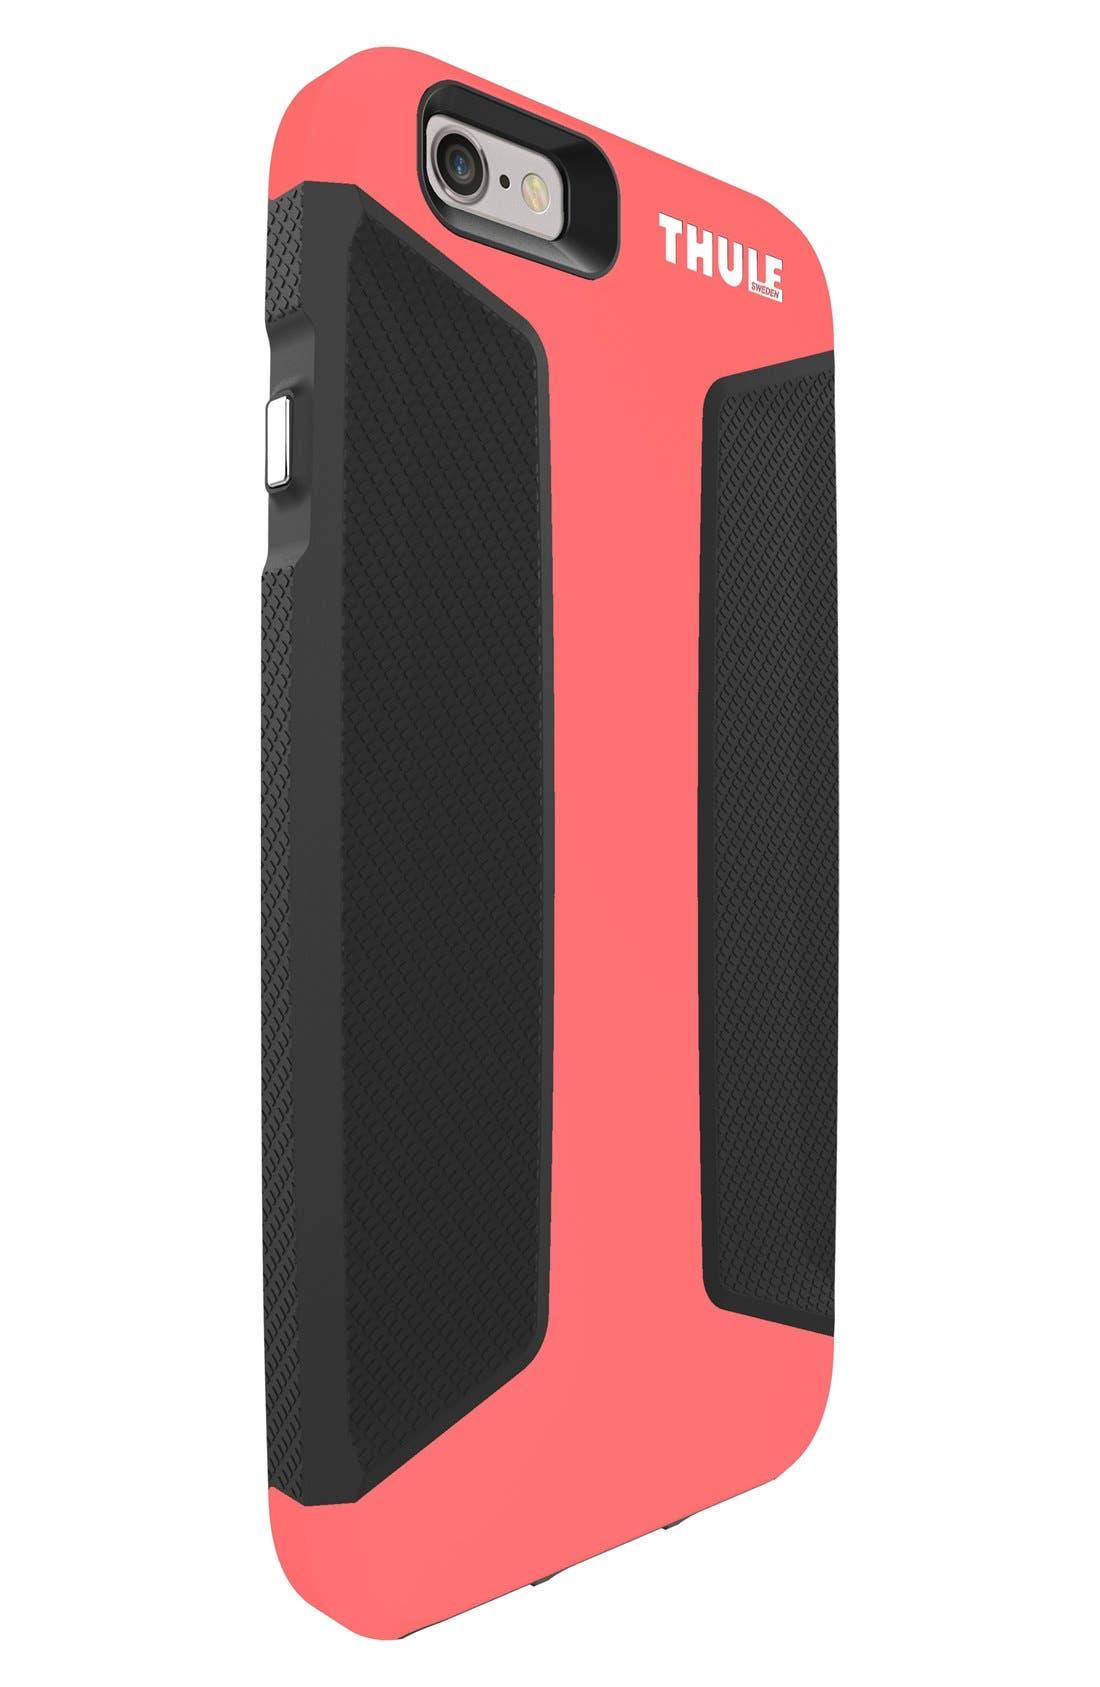 Thule Atmos X4 iPhone 6/6s Case